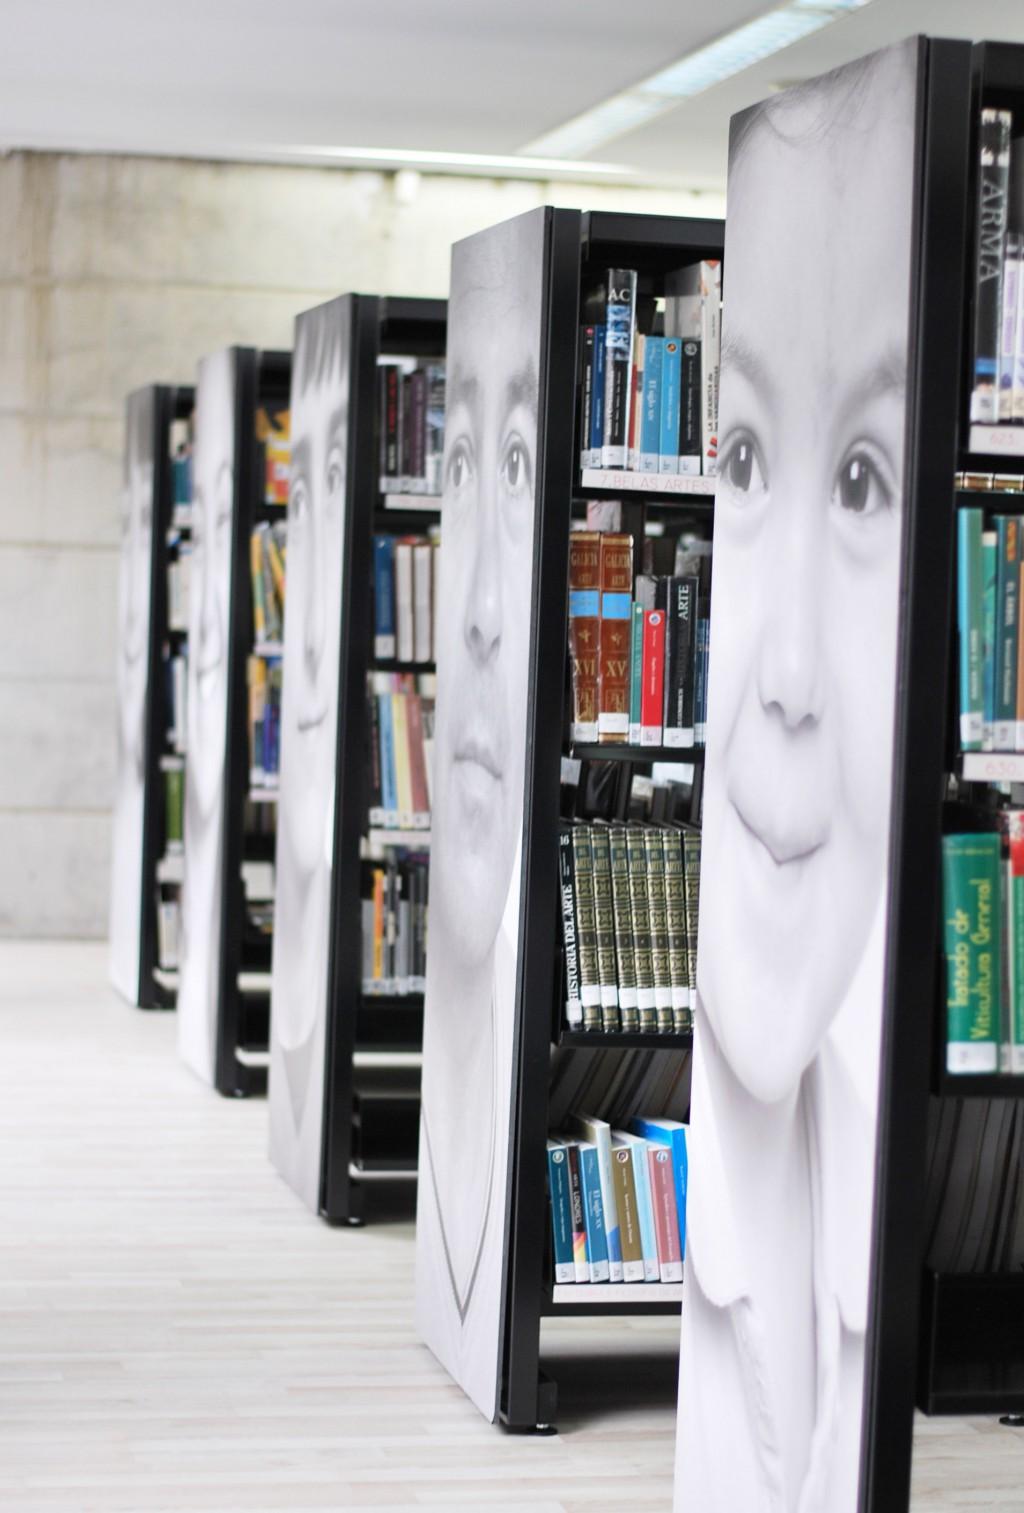 biblioteca_castrillón21